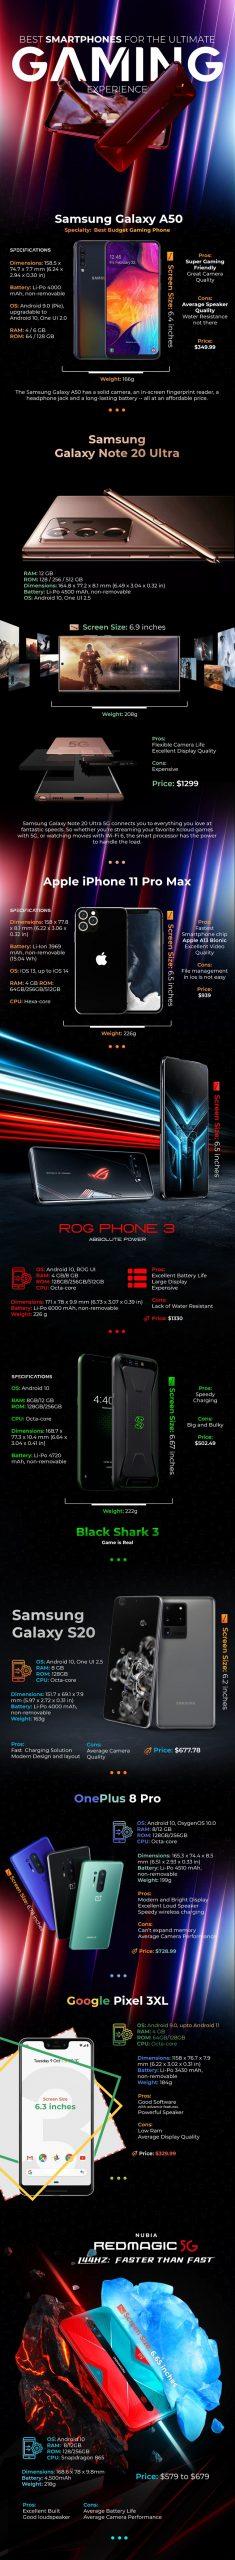 Top 10 High-end Gaming Phones